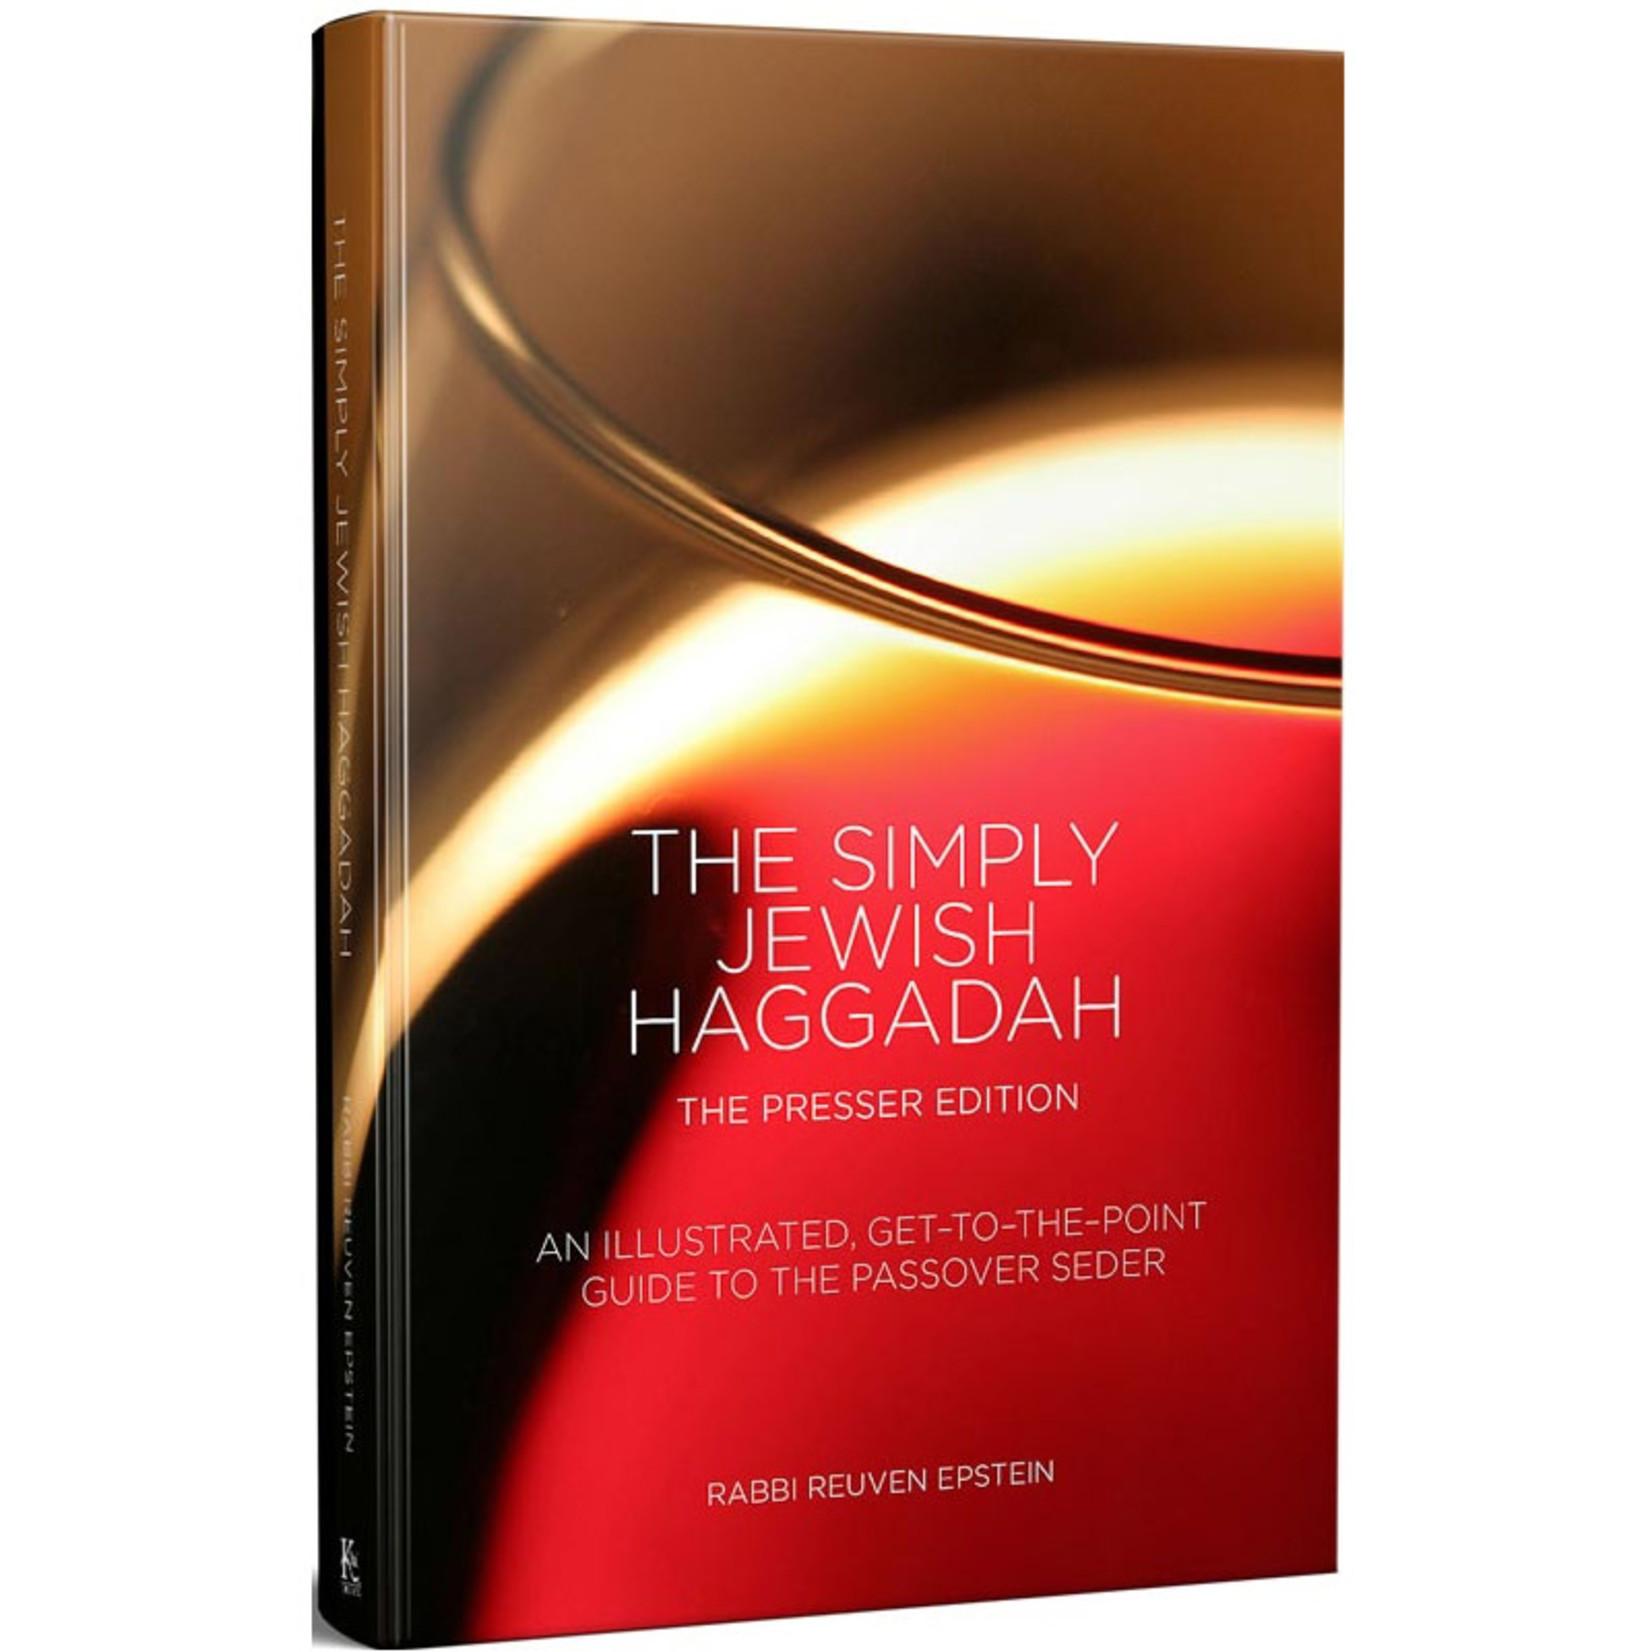 Simply Jewish Haggadah